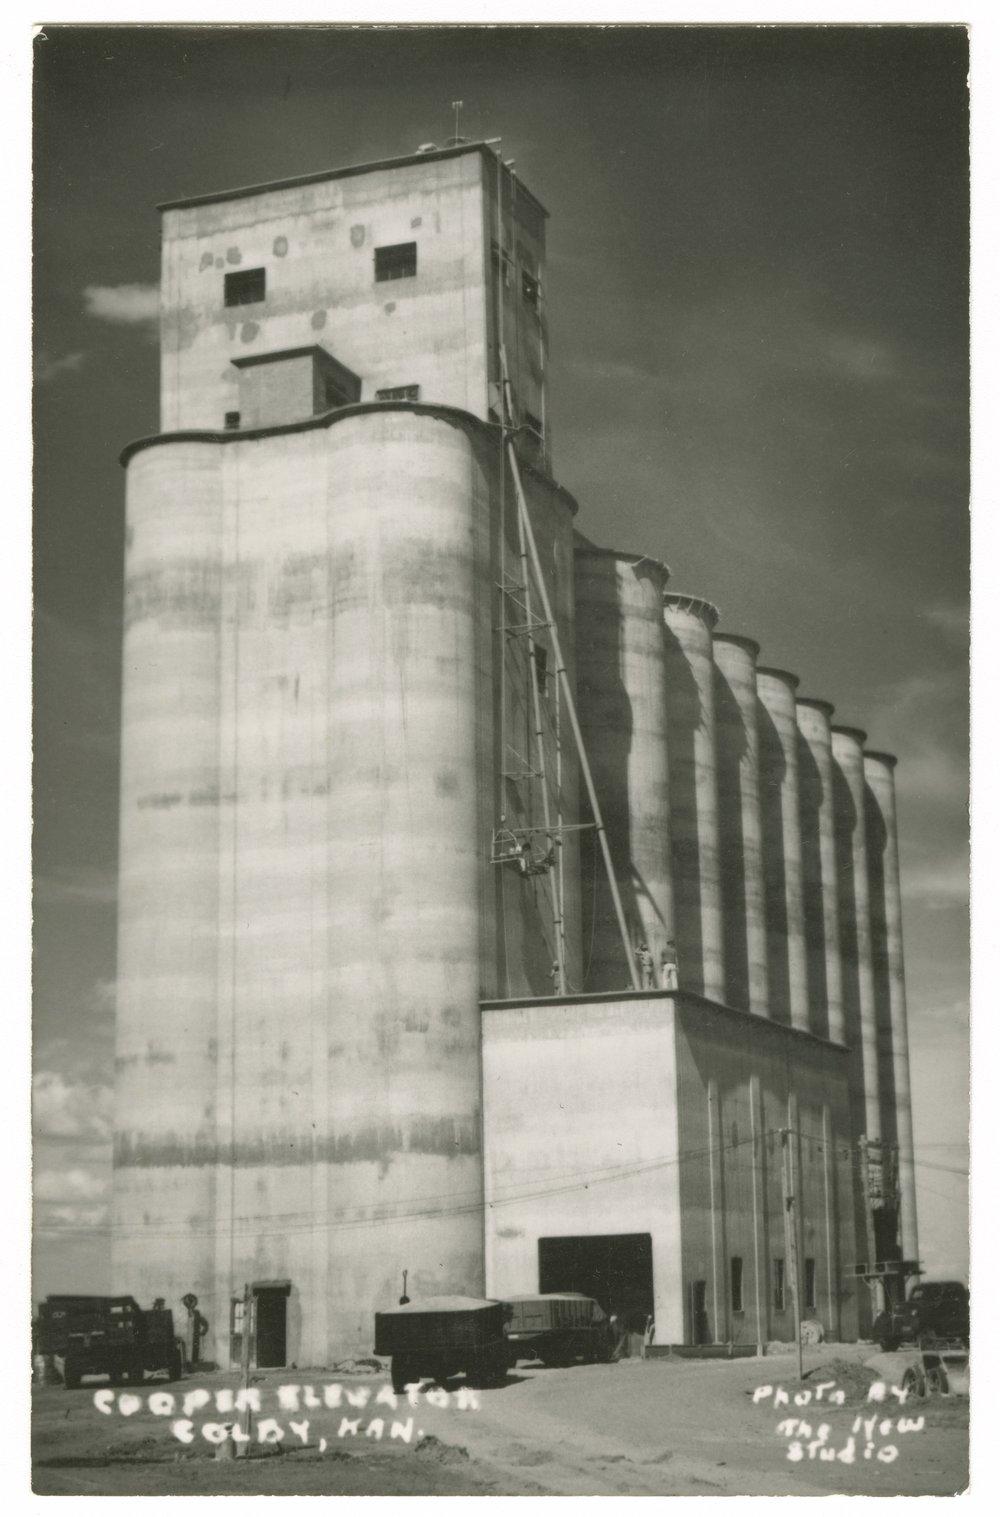 Cooper Elevator, Colby, Thomas County, Kansas - 1